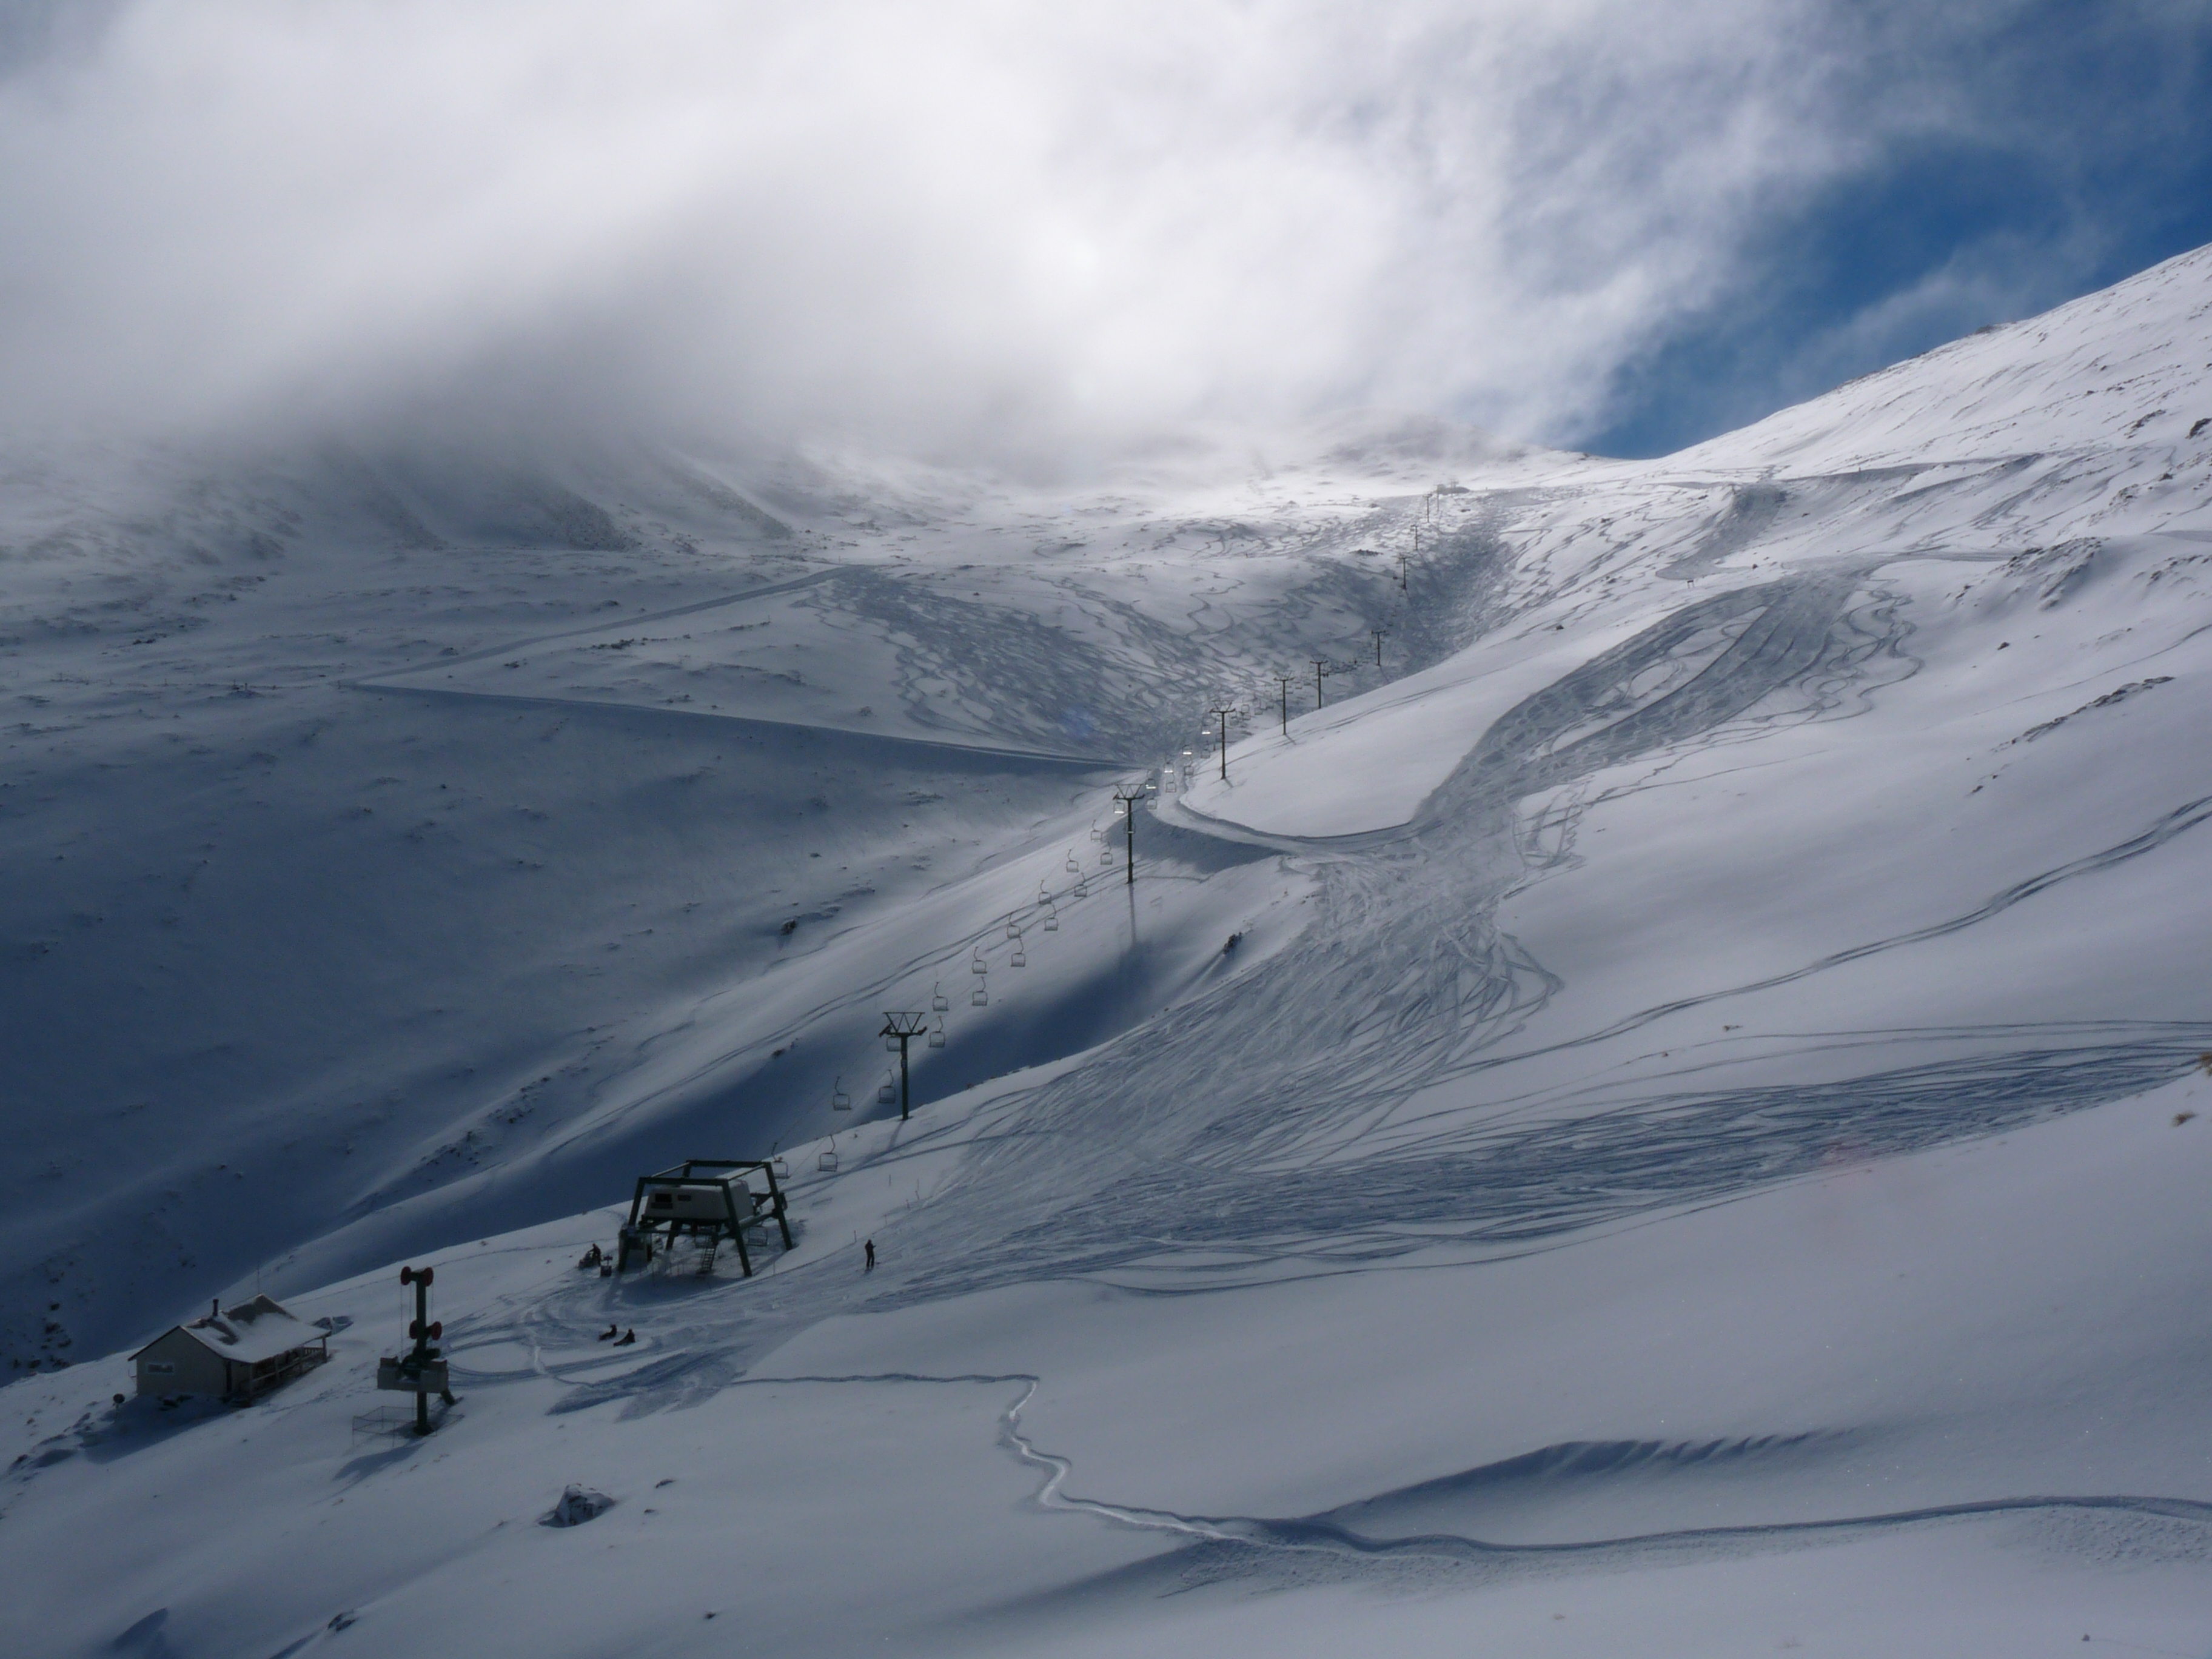 Fresh snow day at Dobson, Mount Dobson